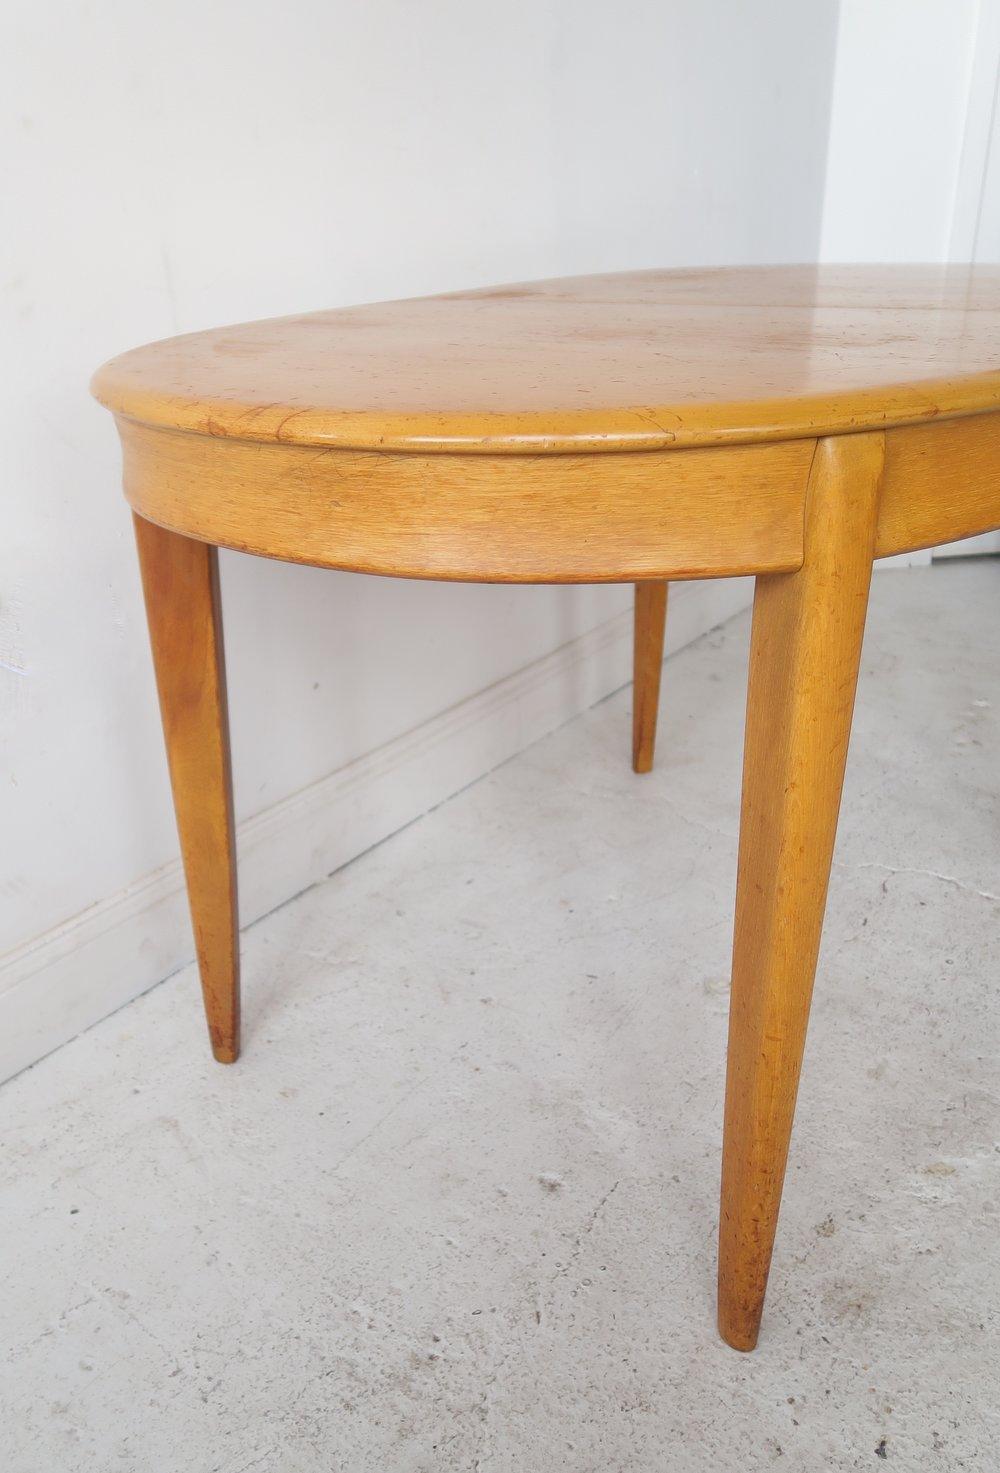 Heywood Wakefield Dining Table. IMG_2490. IMG_2492